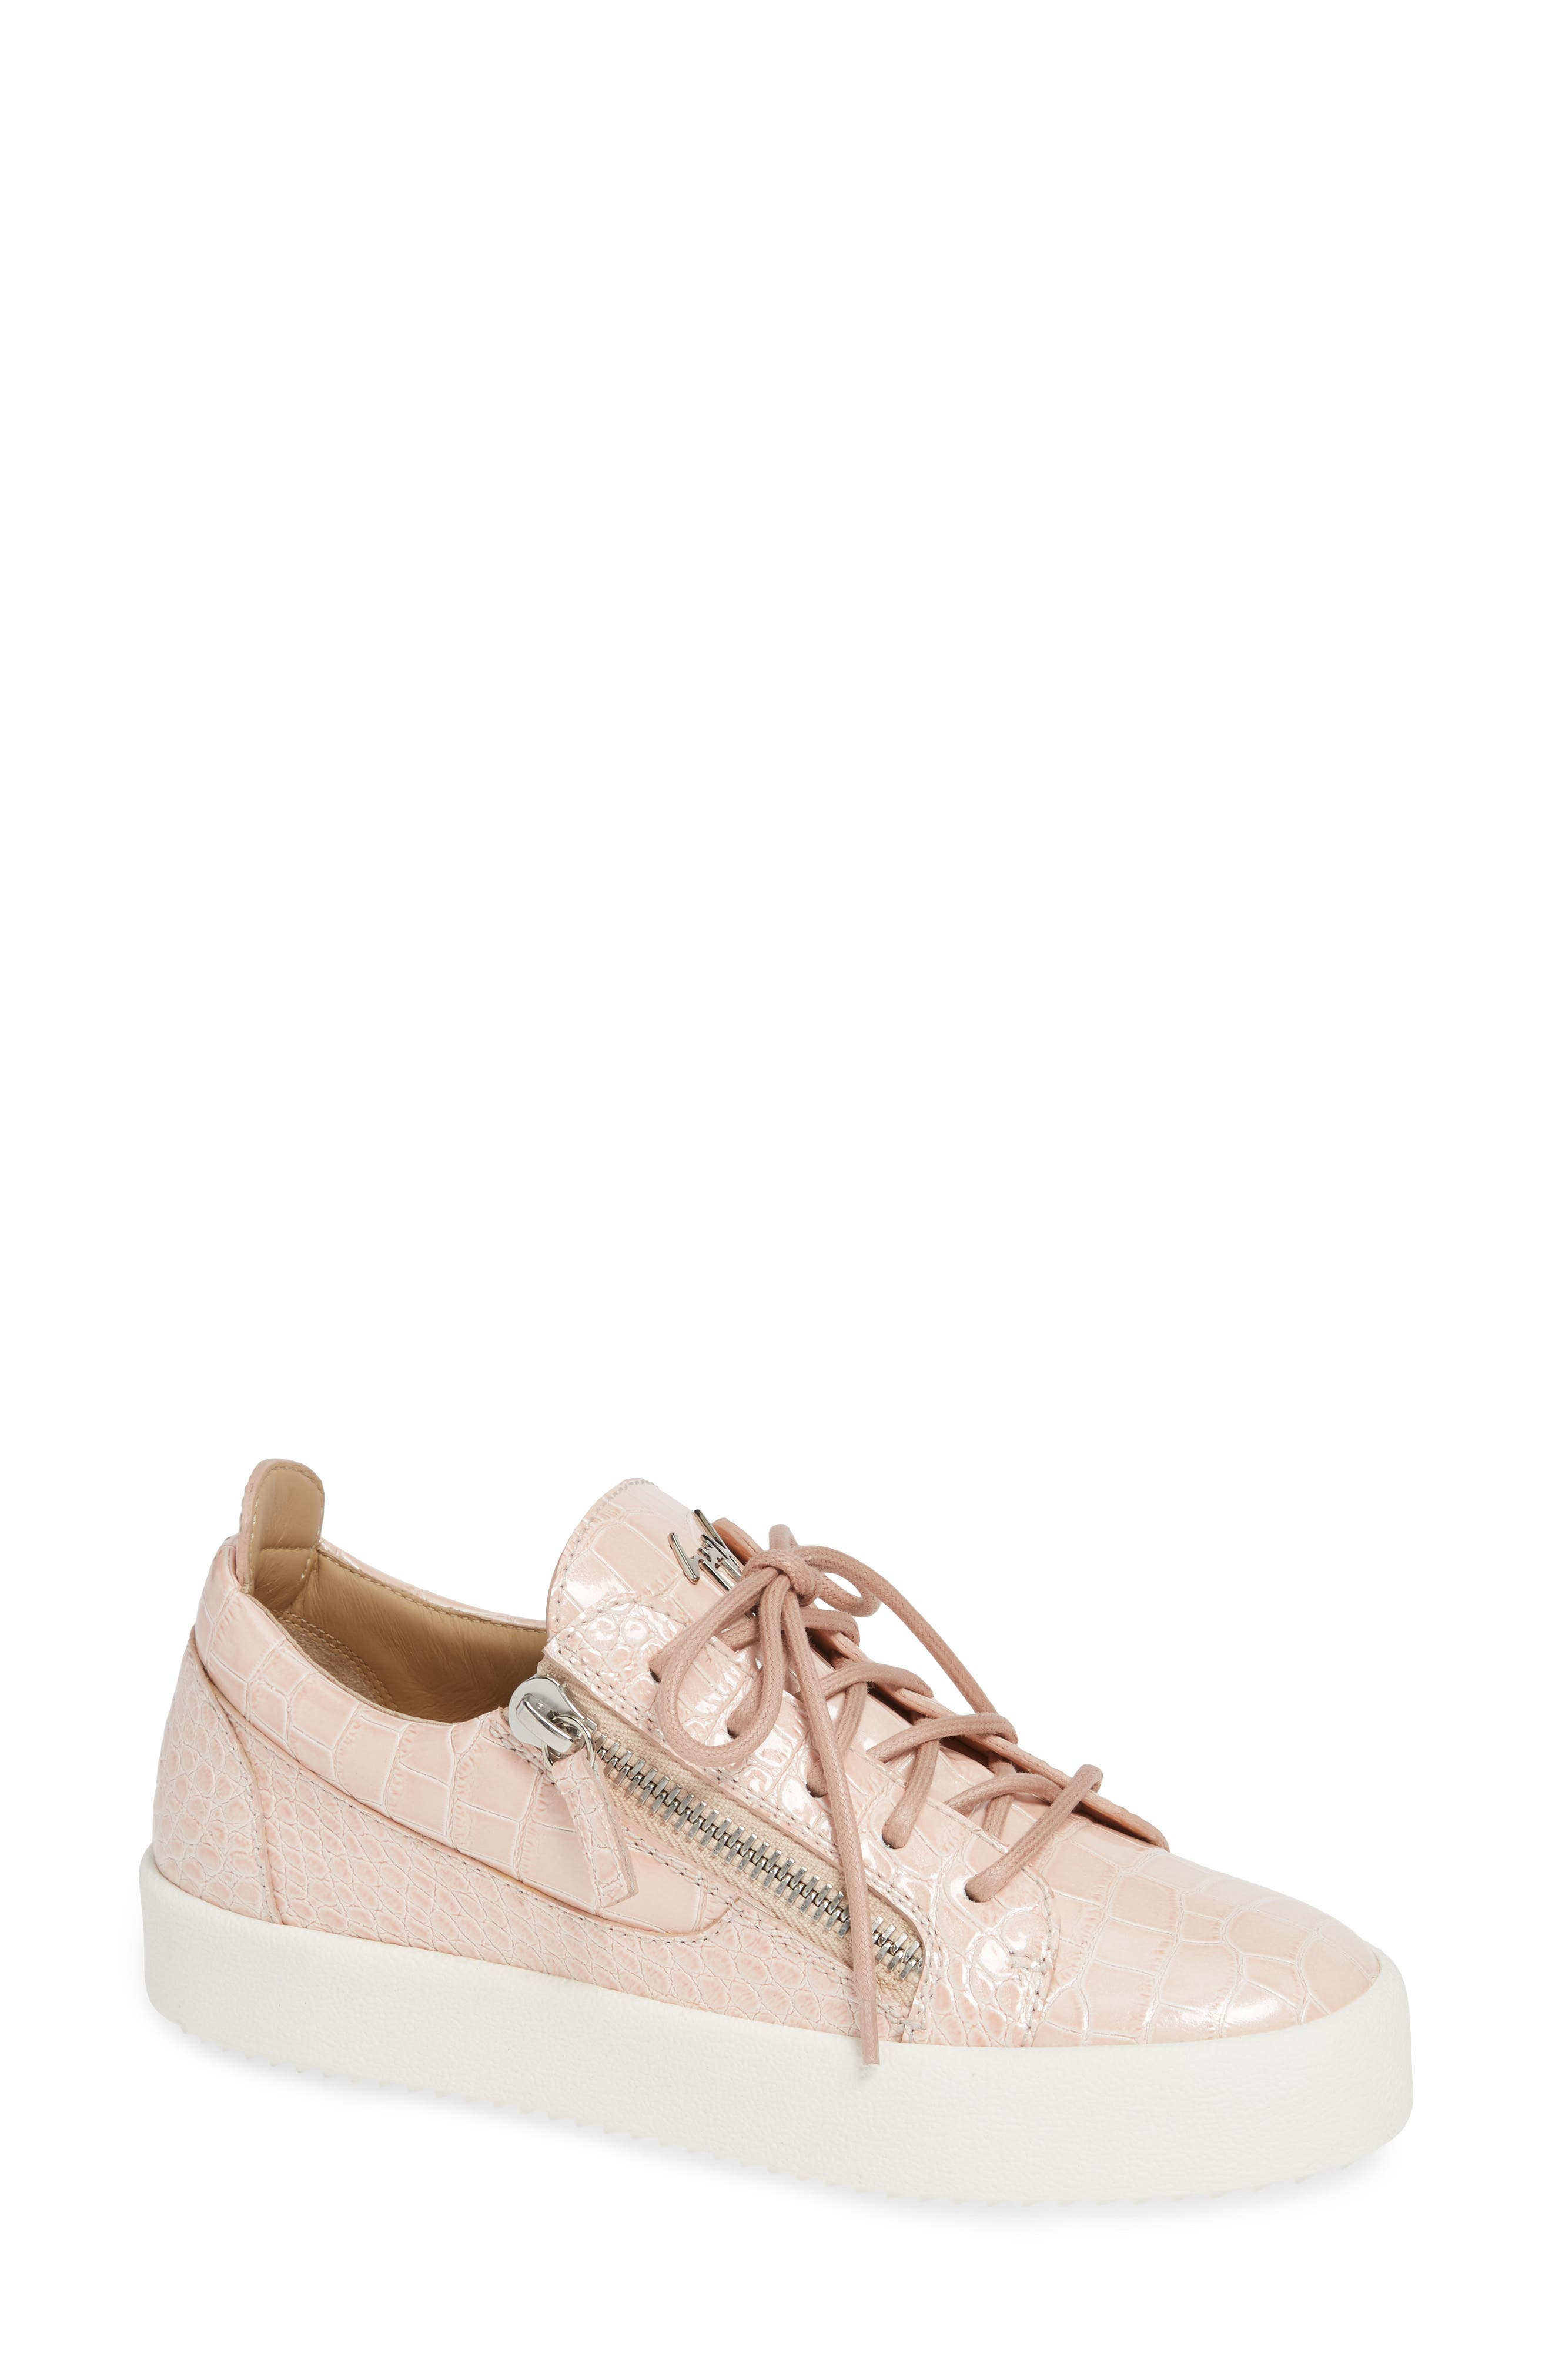 Low Top Sneaker,                             Main thumbnail 1, color,                             NUDE PINK